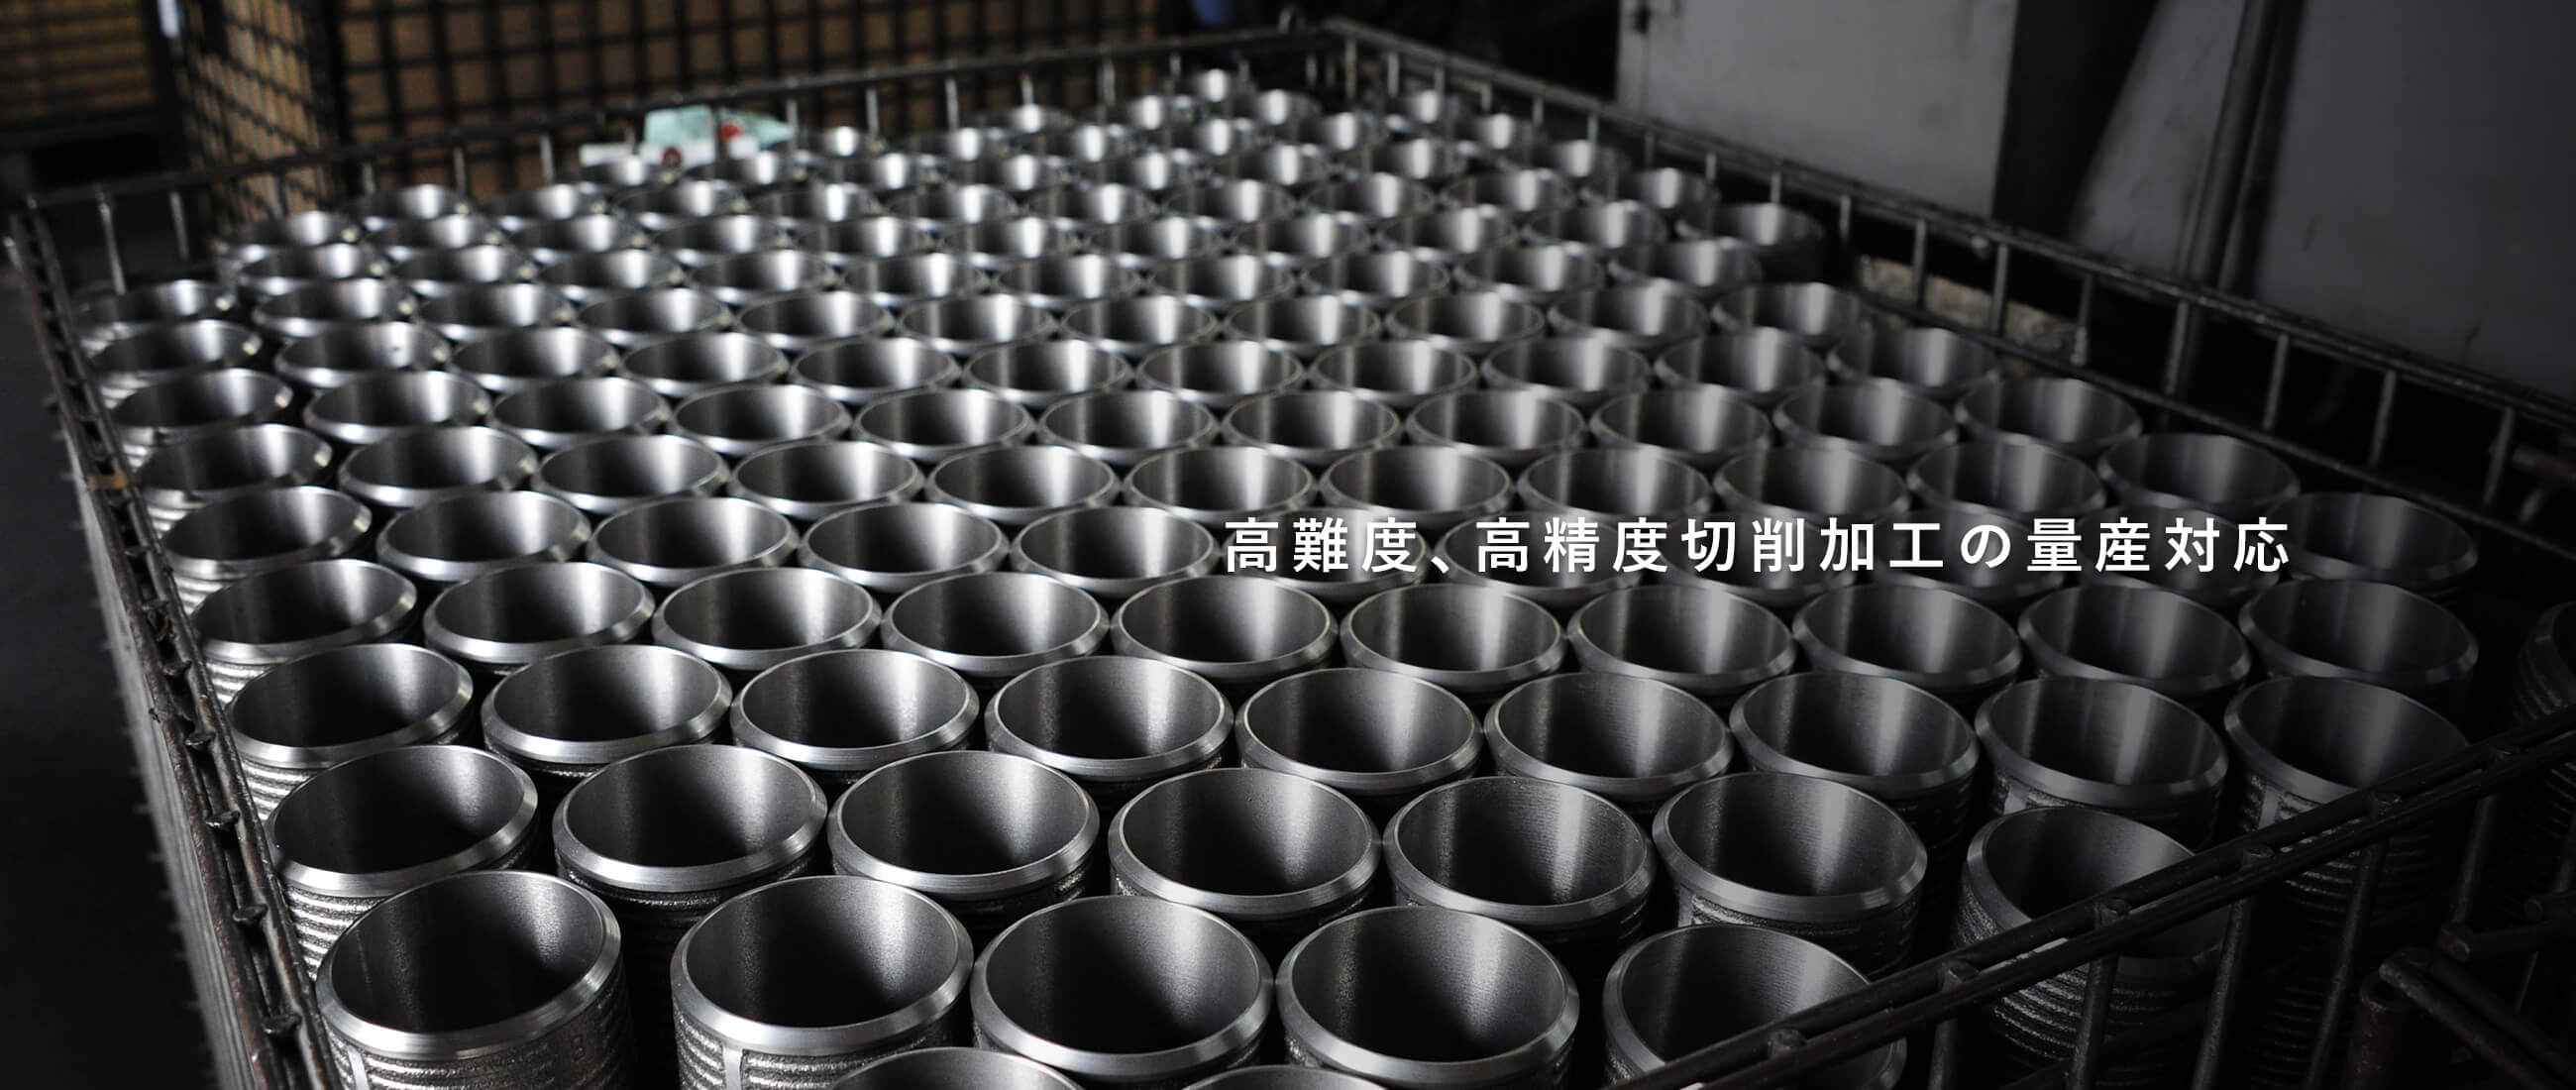 高難度、高精度切削加工の量産対応